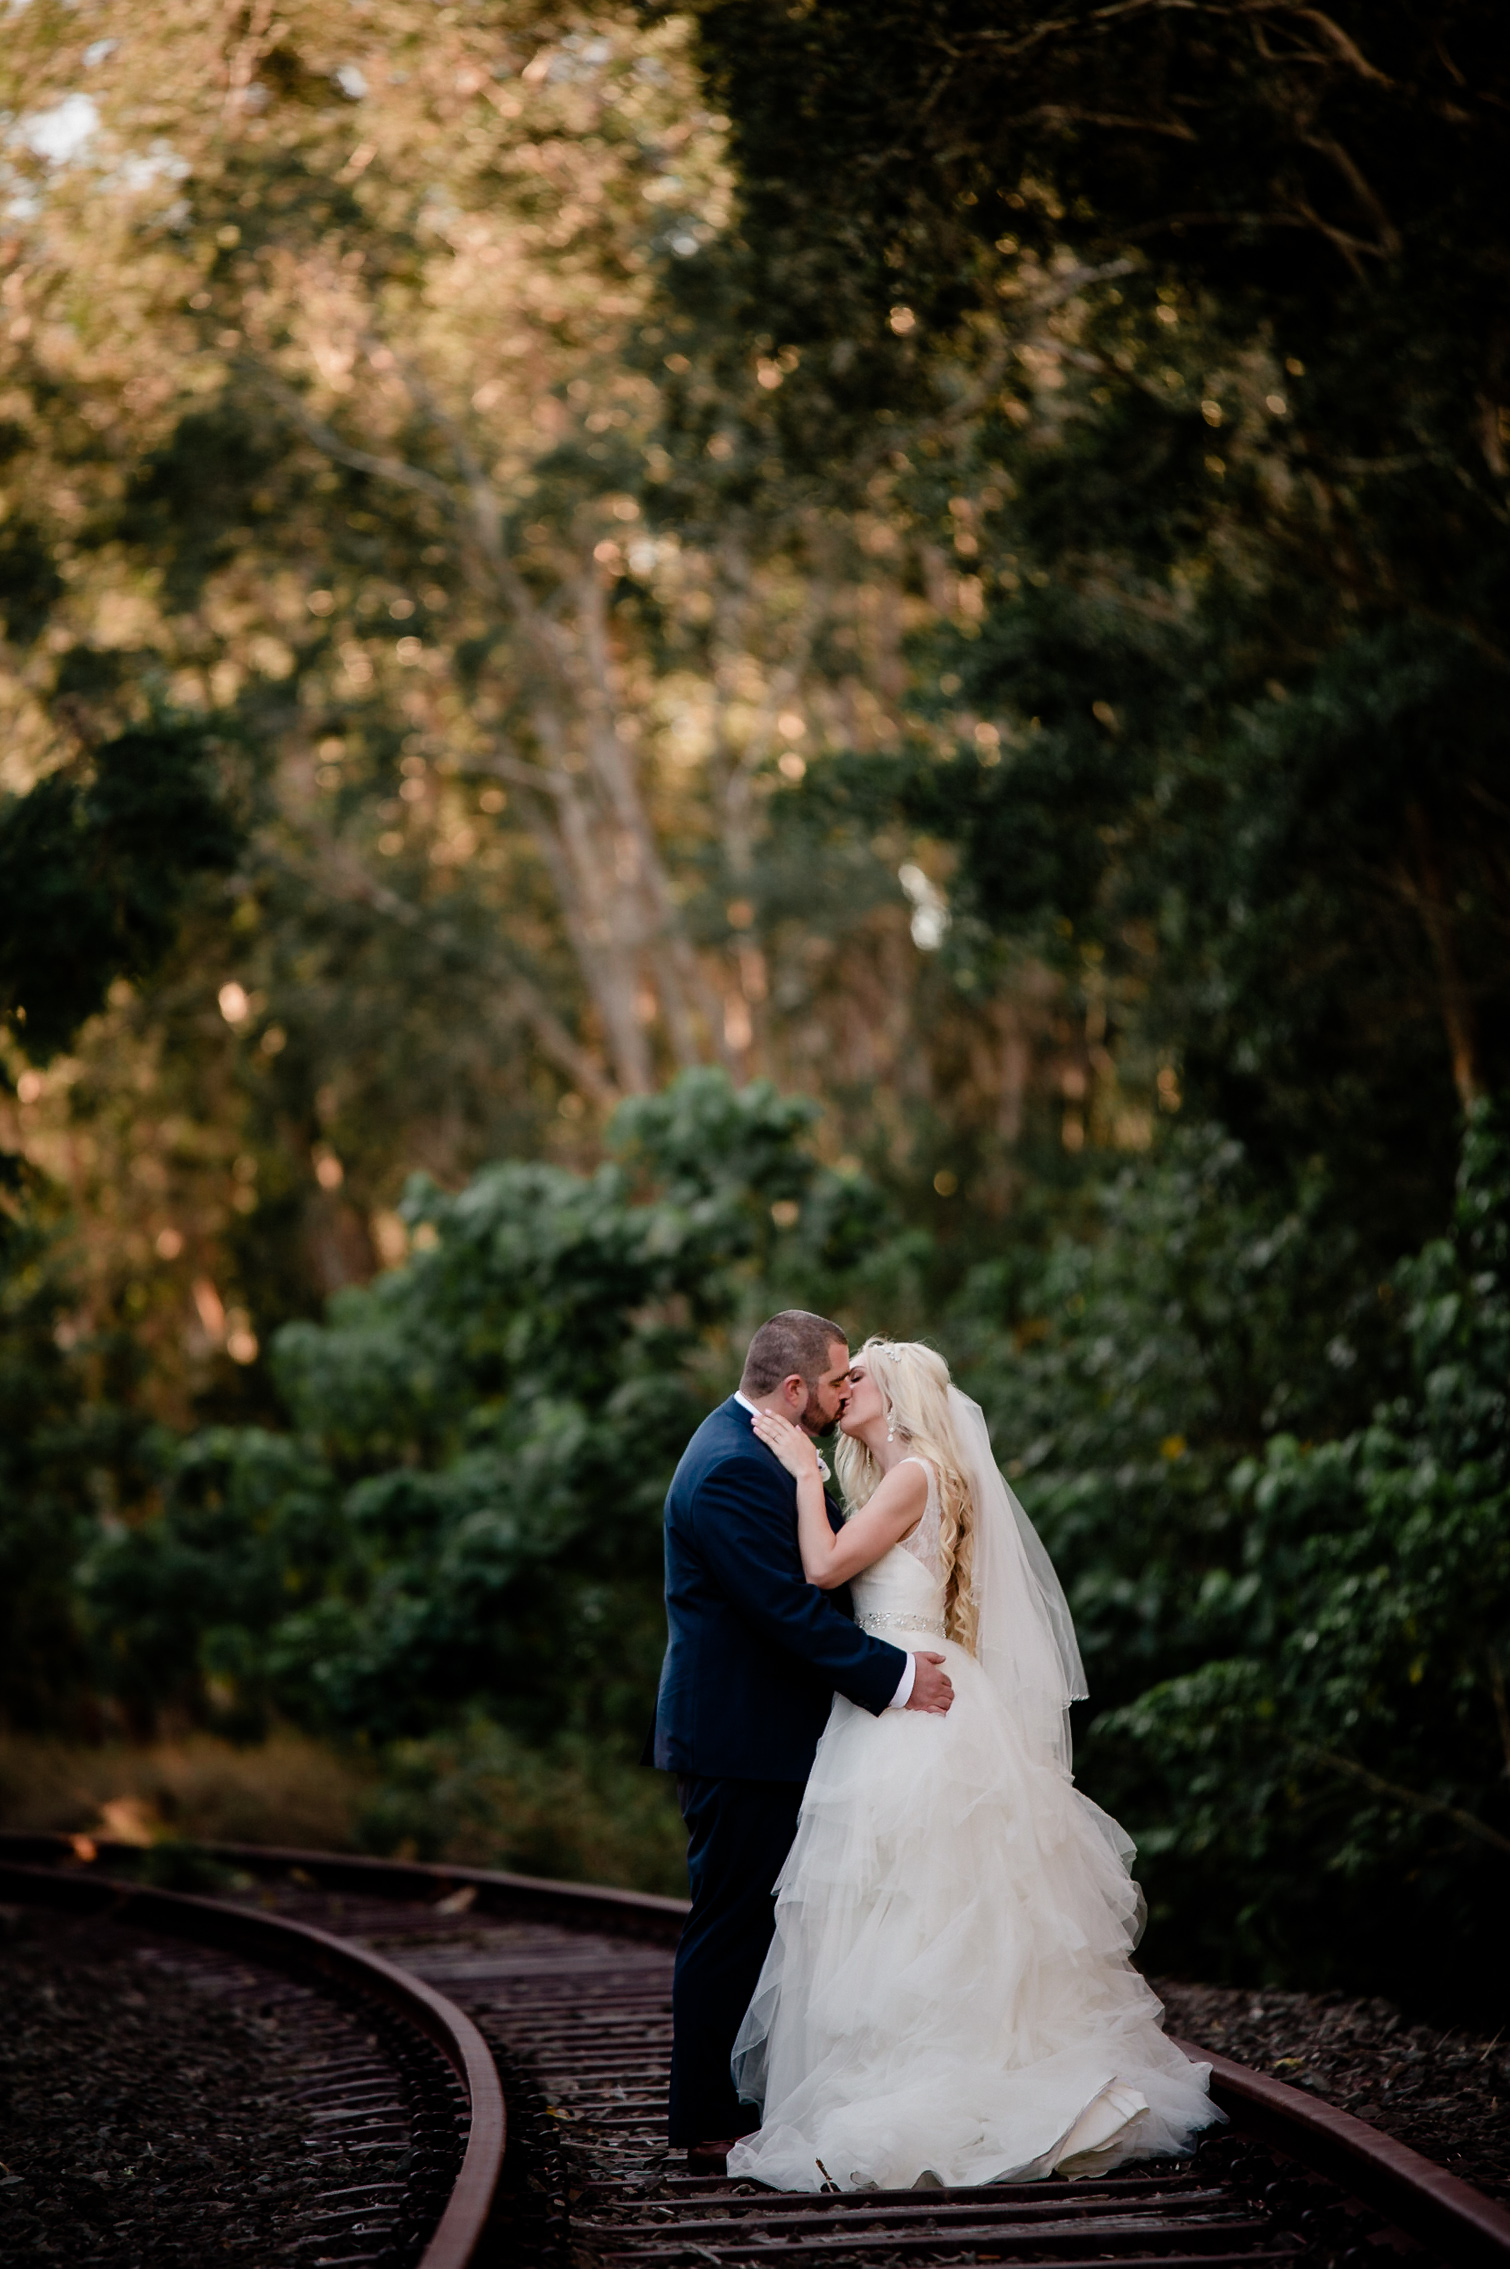 The_Belongil_Byron_Bay_Weddings_New_Black_Studios-112.jpg